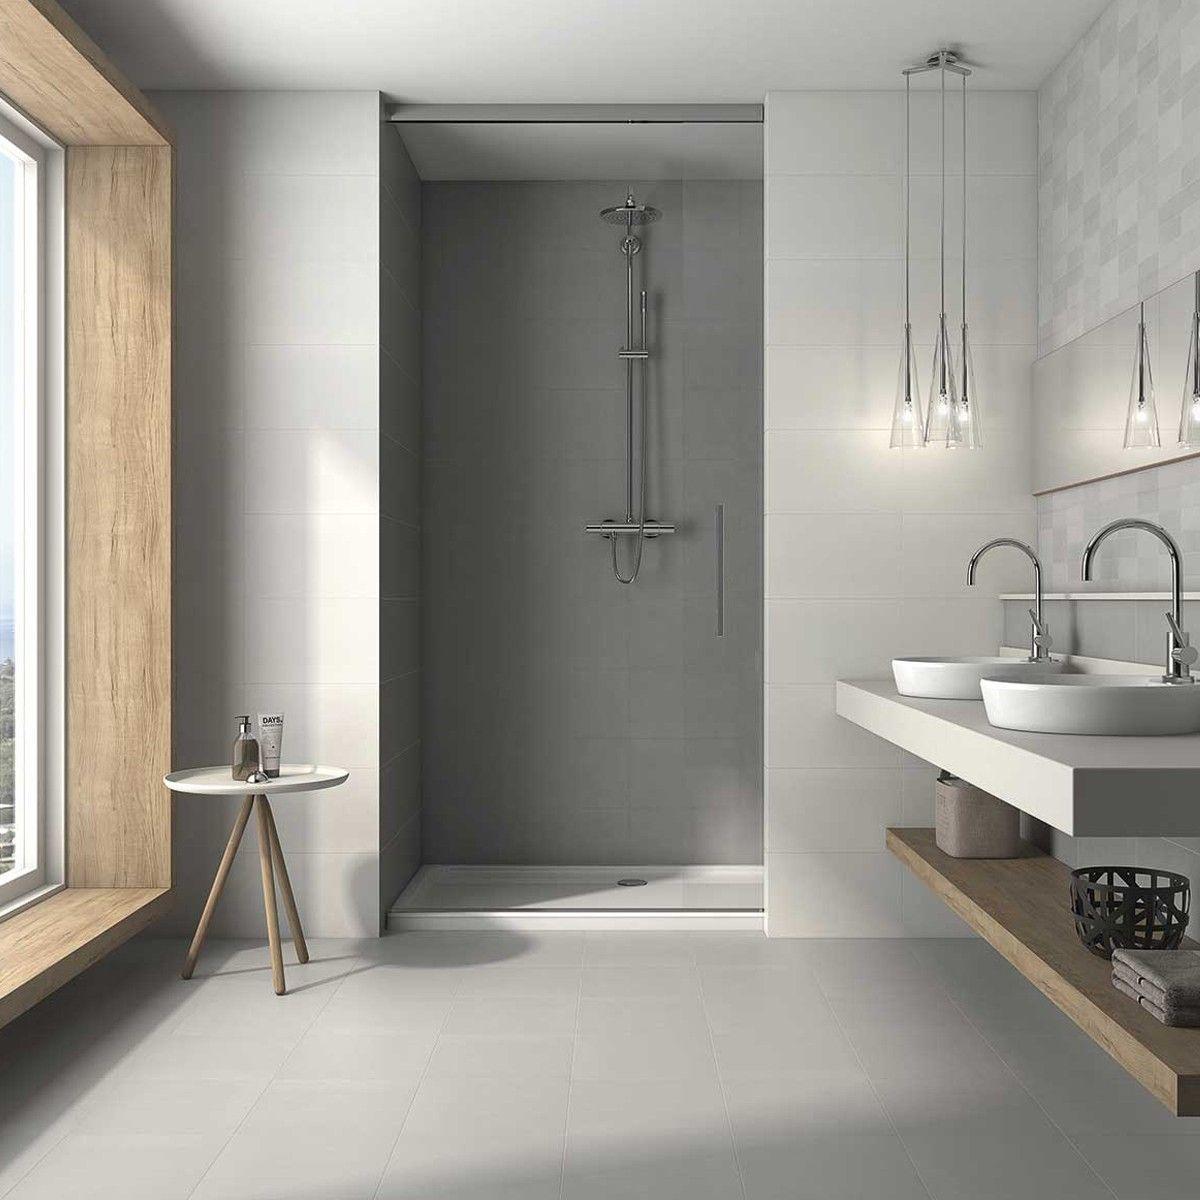 31.6x31.6 Mono Colore Gris | SKU: 010175 | Tile Choice | Flooring ...